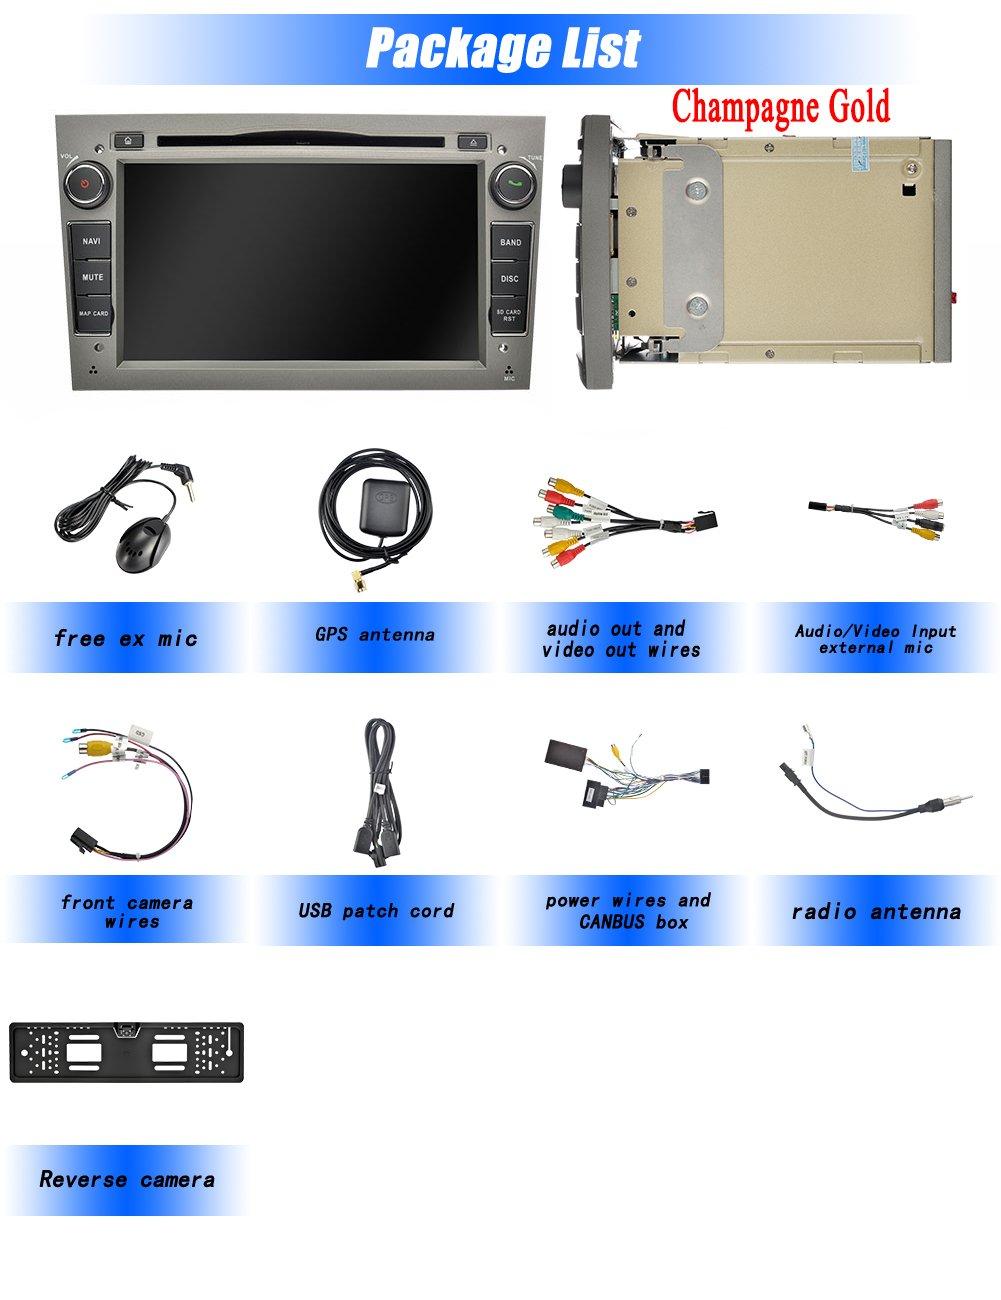 Ohok 2 DIN Android 8.0.0 Autoradio 7 Pulgadas Oreo Octa Core 4GB Ram 32GB ROM GPS Navegador Radio Soporta Bluetooth WiFi AV-IN SWC para Opel Vauxhall Astra ...